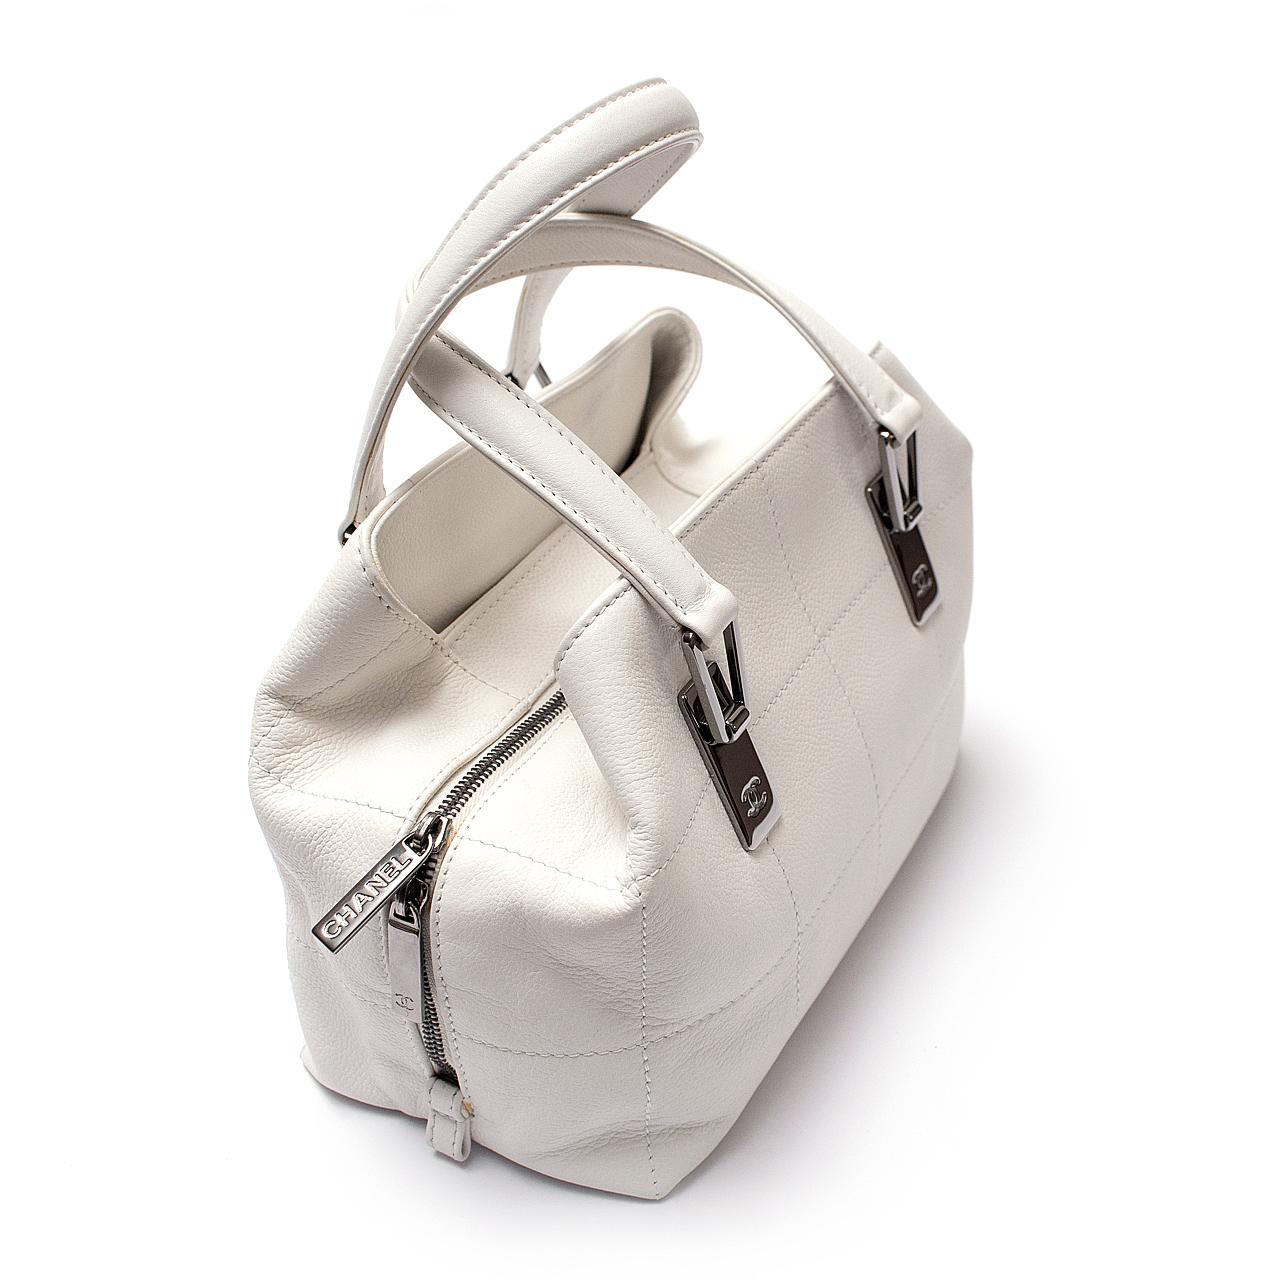 21604620d Bolsa Chanel Boston | Box de Grife